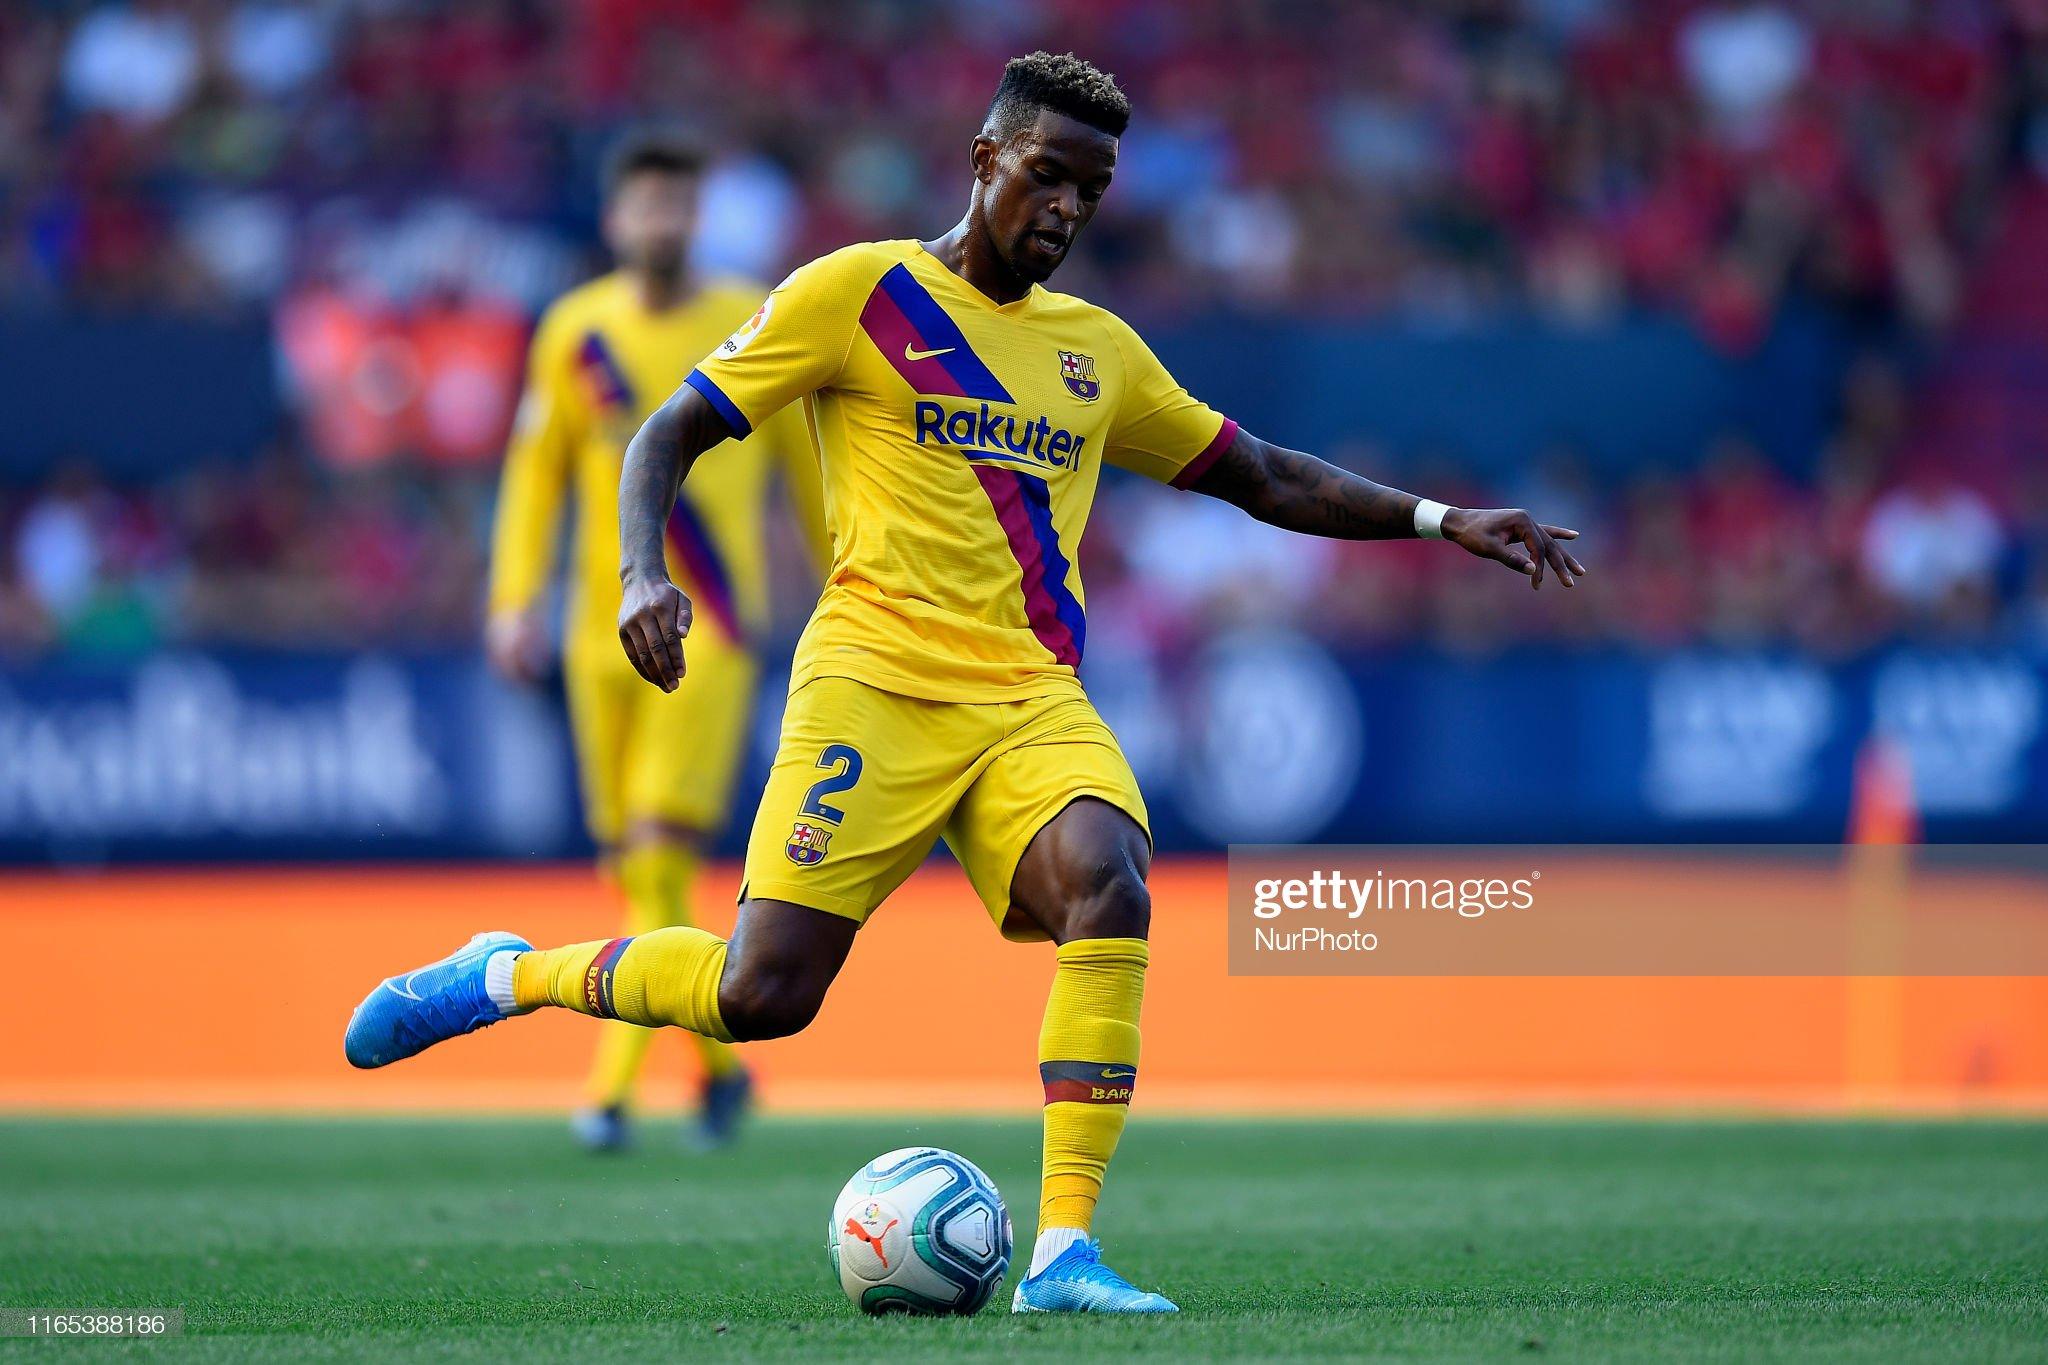 صور مباراة : أوساسونا - برشلونة 2-2 ( 31-08-2019 )  Nelson-semedo-of-barcelona-does-passed-during-the-liga-match-between-picture-id1165388186?s=2048x2048